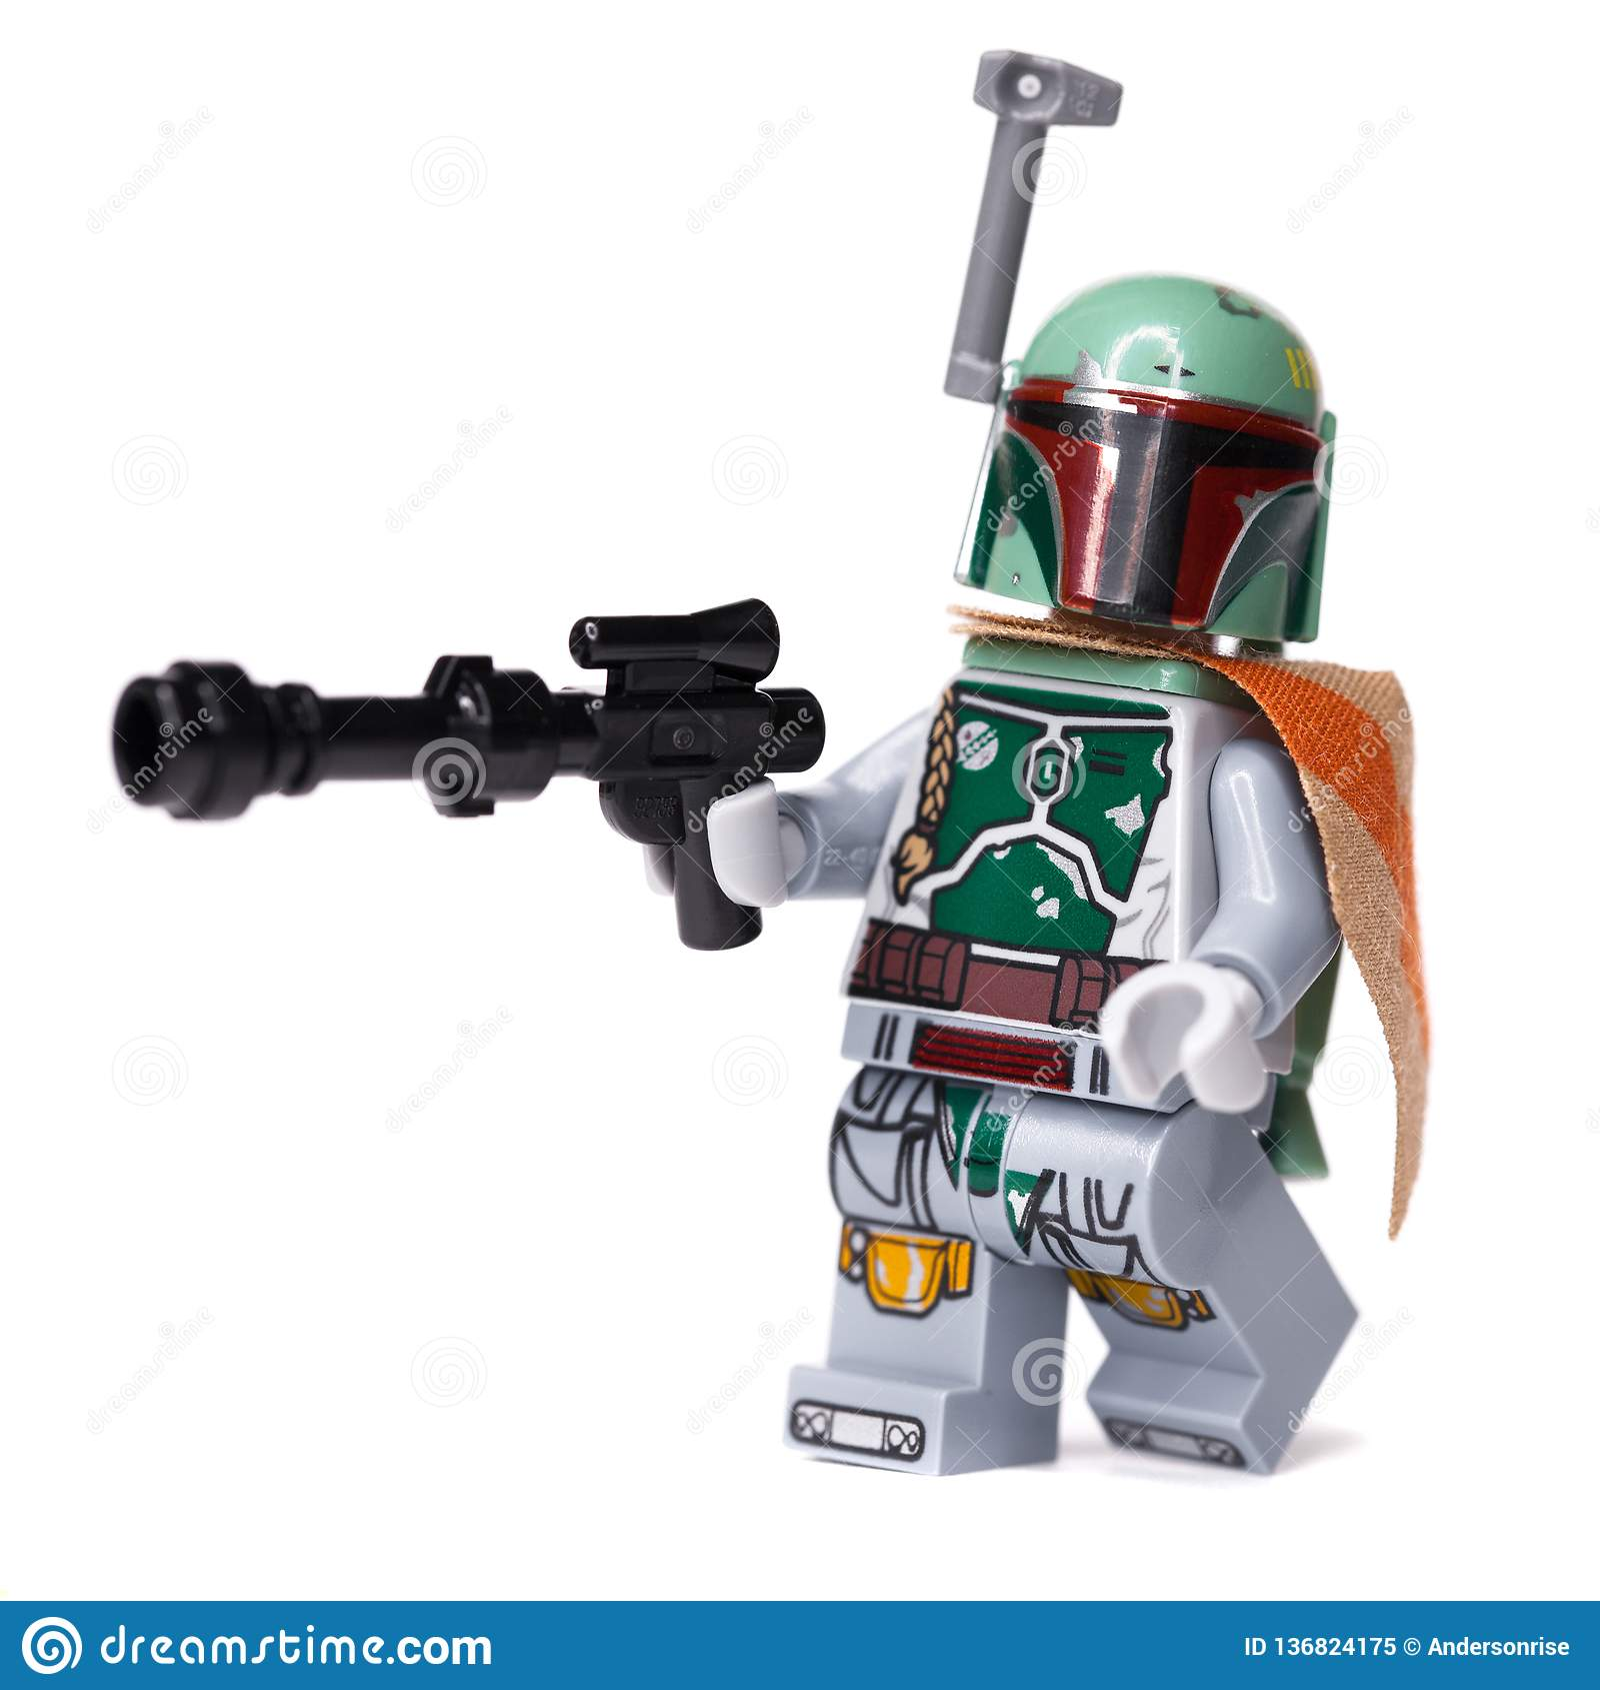 RUSSO, 16, 2019 Construtor Lego Star Wars Caçador de prêmios de Boba Fett